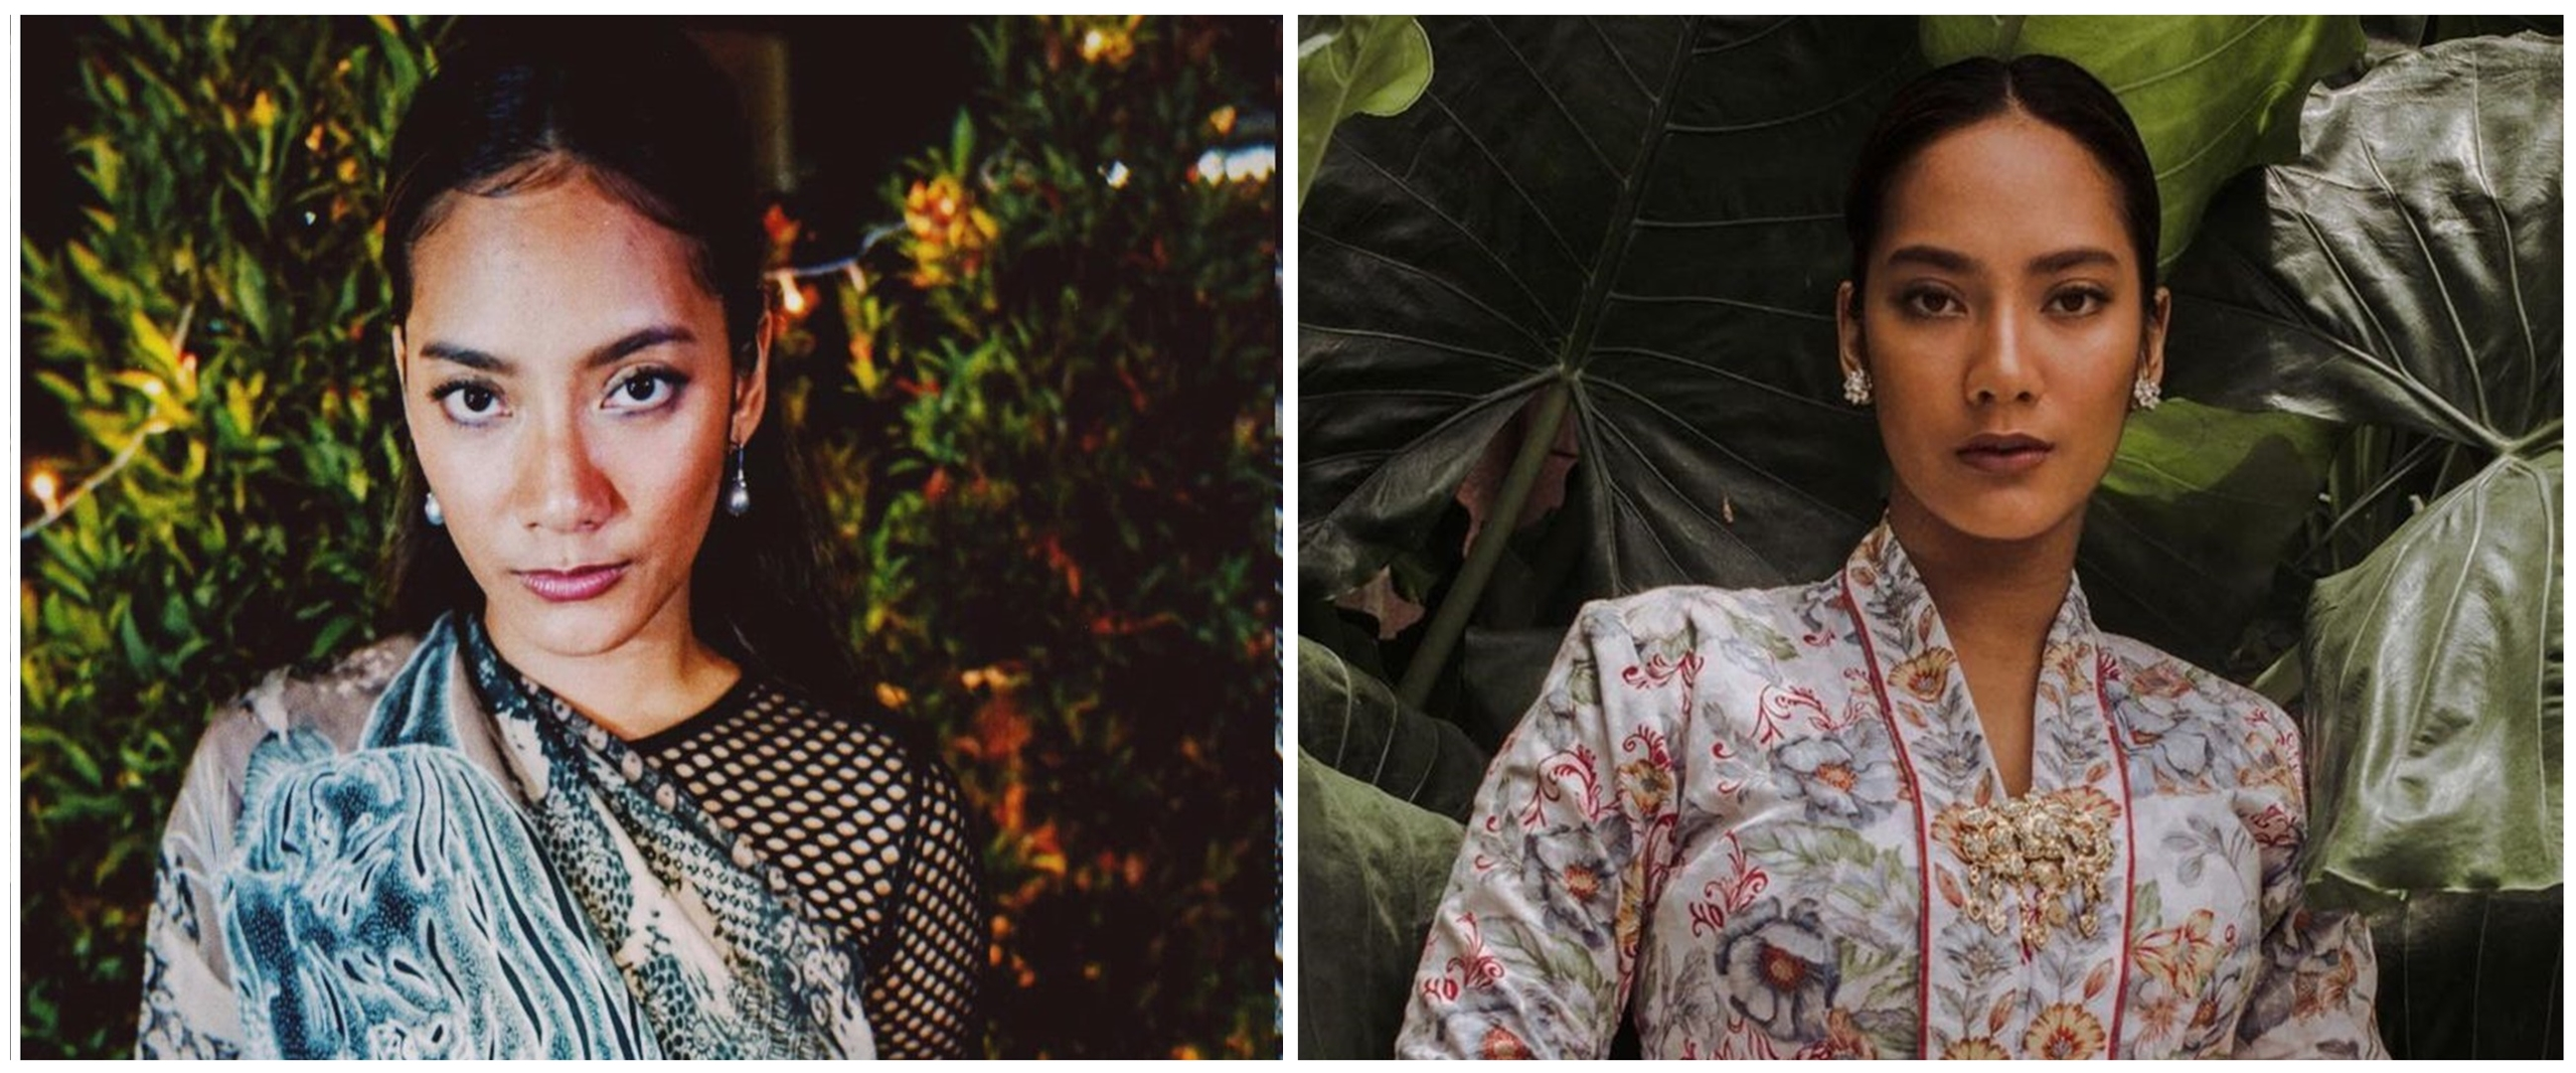 Sempat dikira hamil, begini 6 potret penampilan terbaru Tara Basro